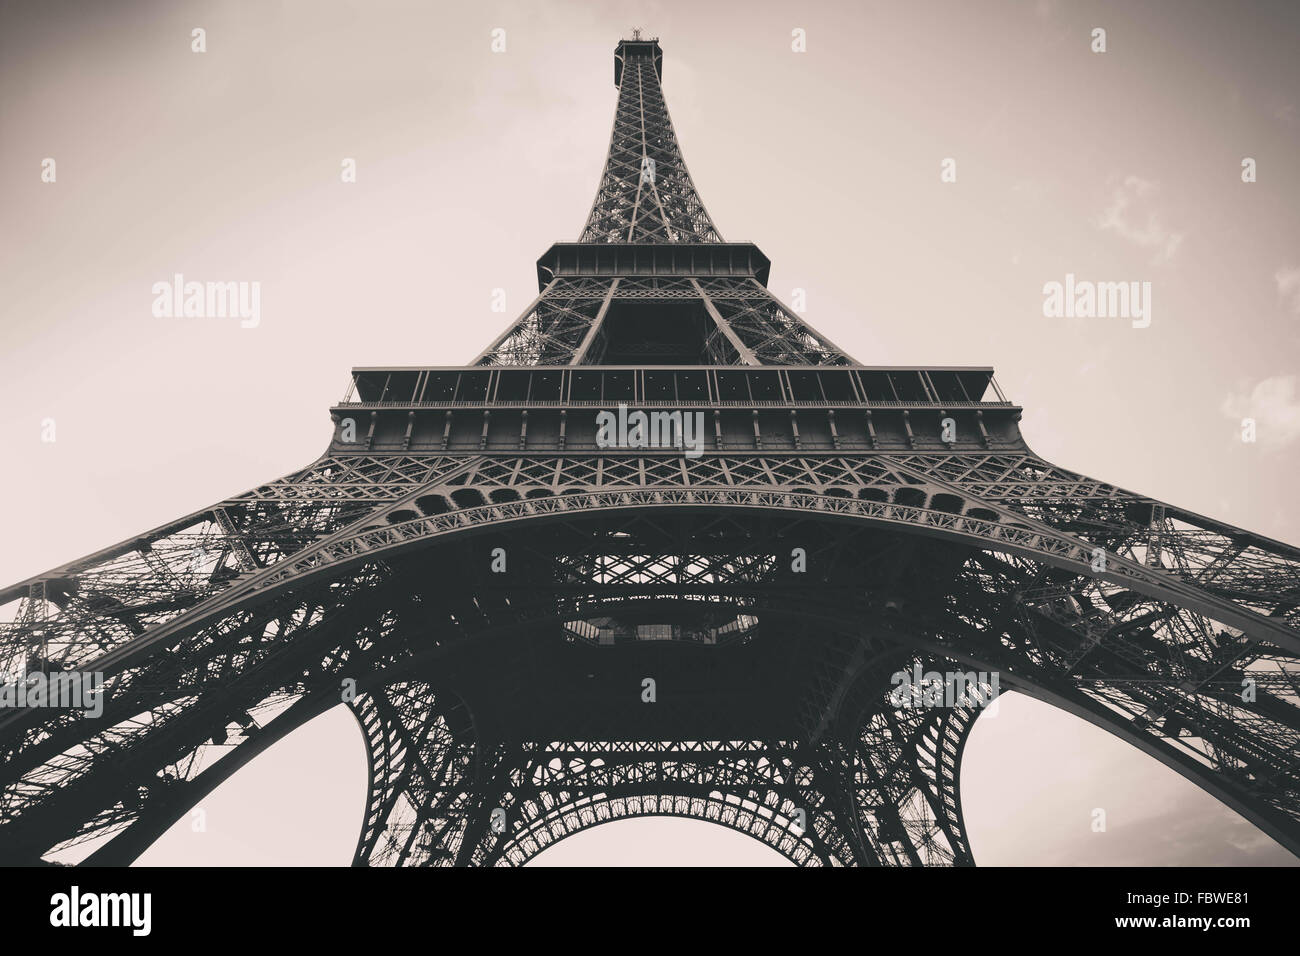 Vintage filter effect Eiffel Tower in Paris - Stock Image